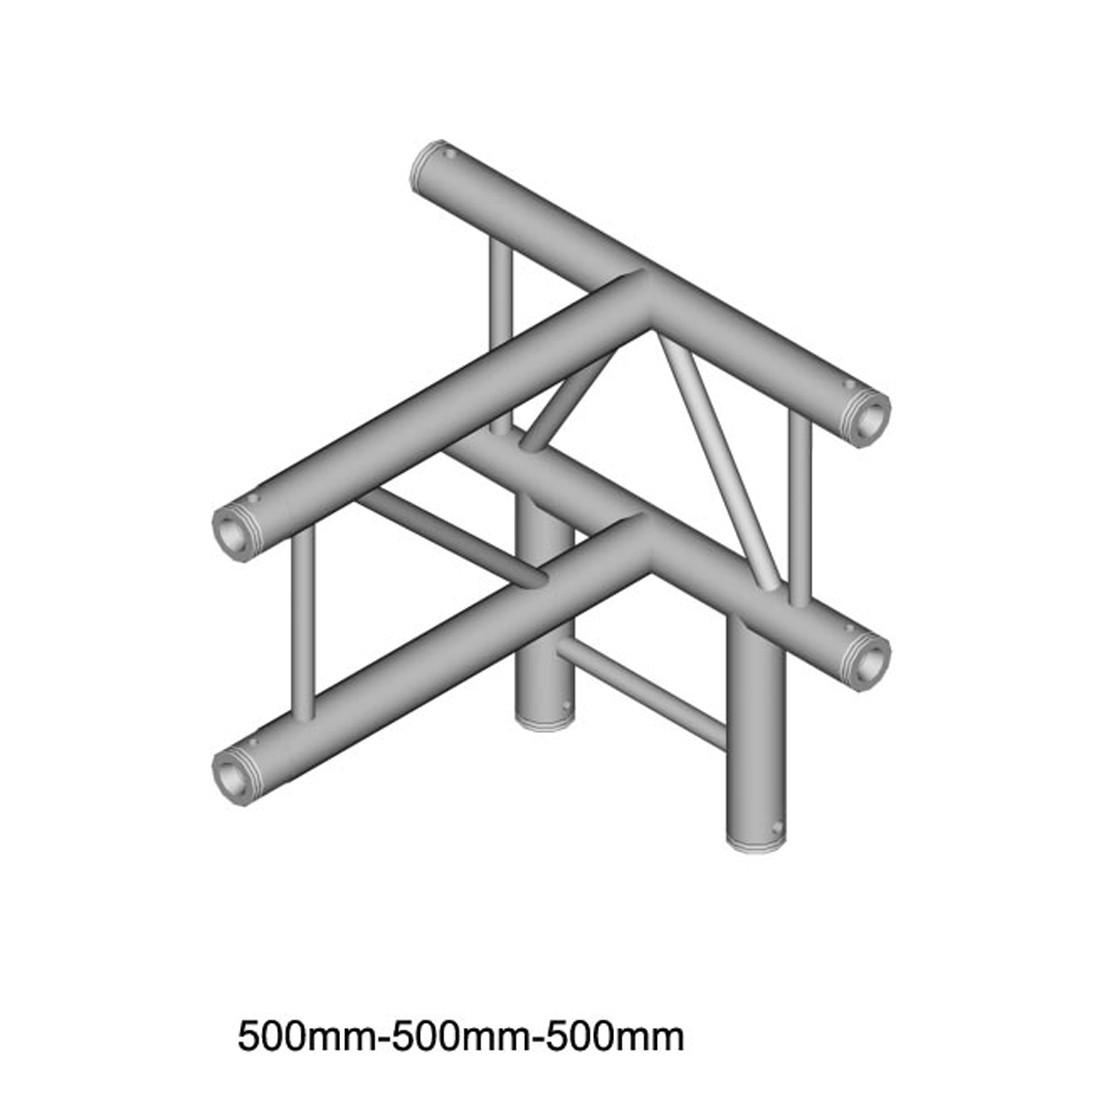 DT 32/2-T42V-TD - DT 32/2 - Ladder Truss - Termékek